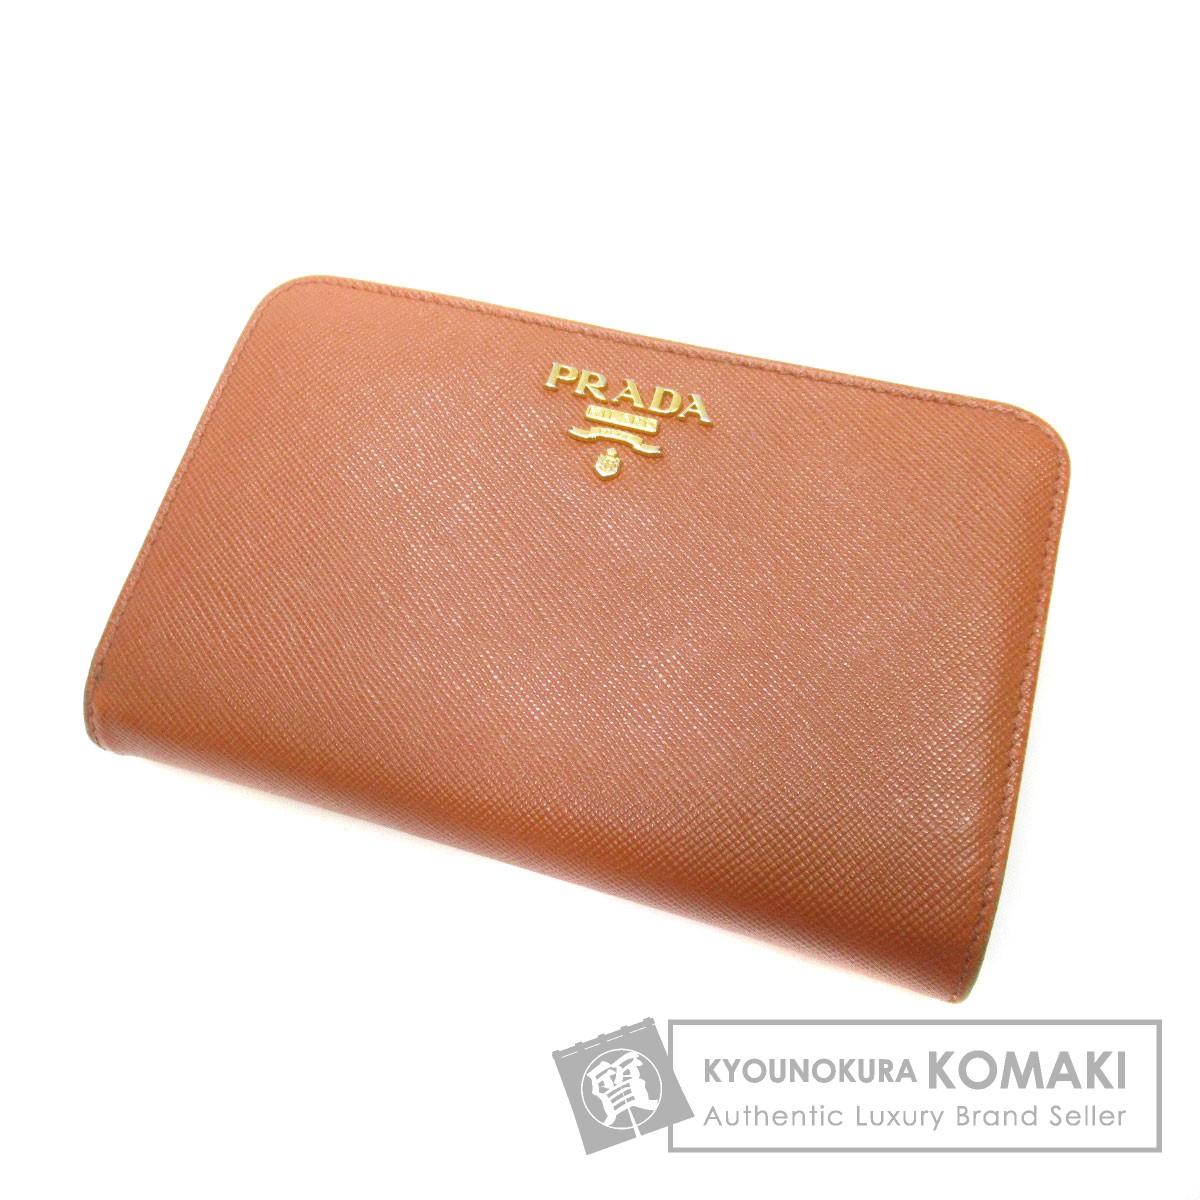 PRADA ロゴモチーフ 二つ折り財布(小銭入れあり) レザー レディース 【中古】【プラダ】